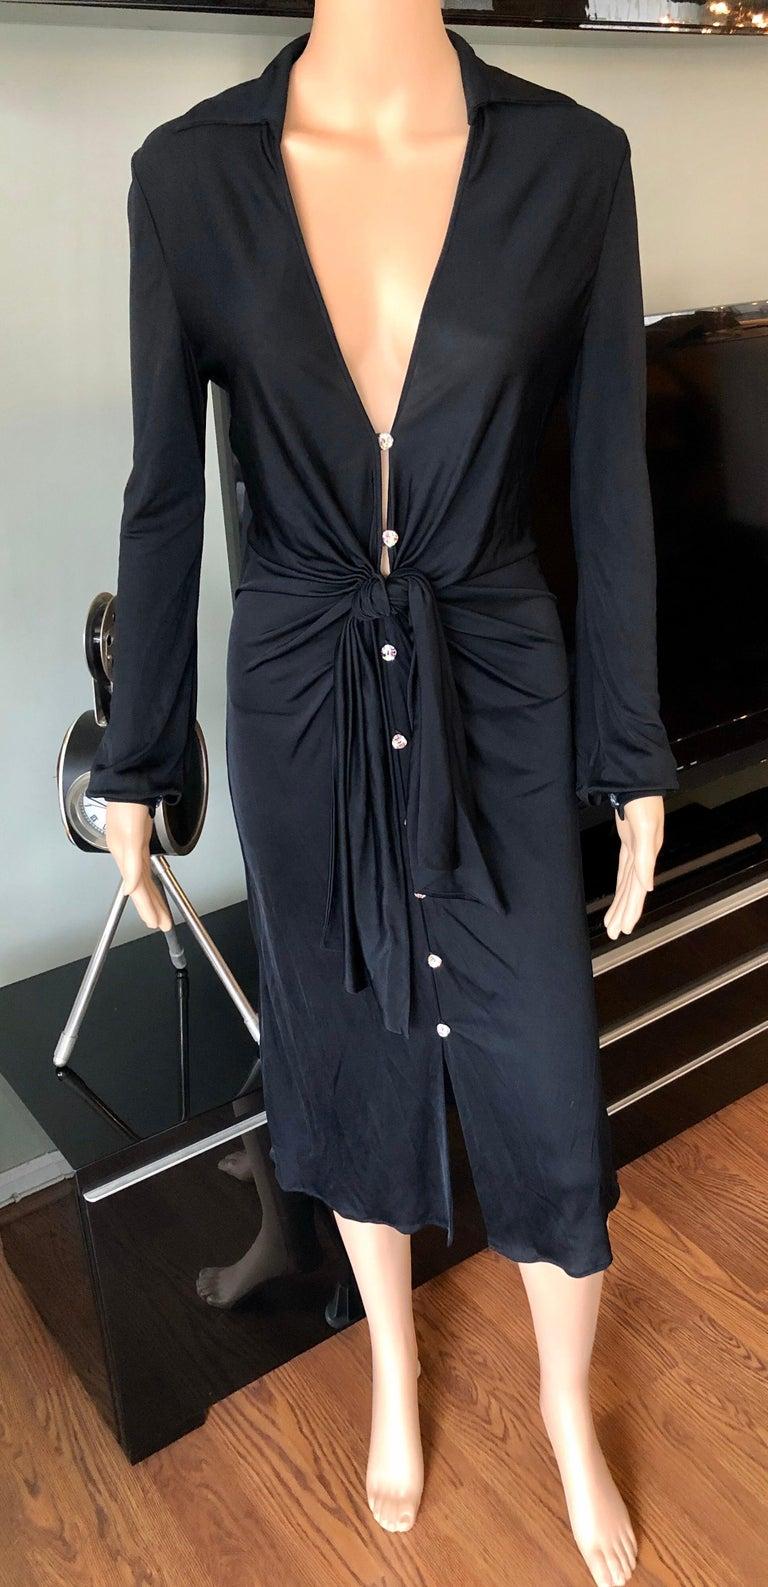 Women's Gianni Versace S/S 2000 Runway Vintage Plunging Neckline Black Dress  For Sale